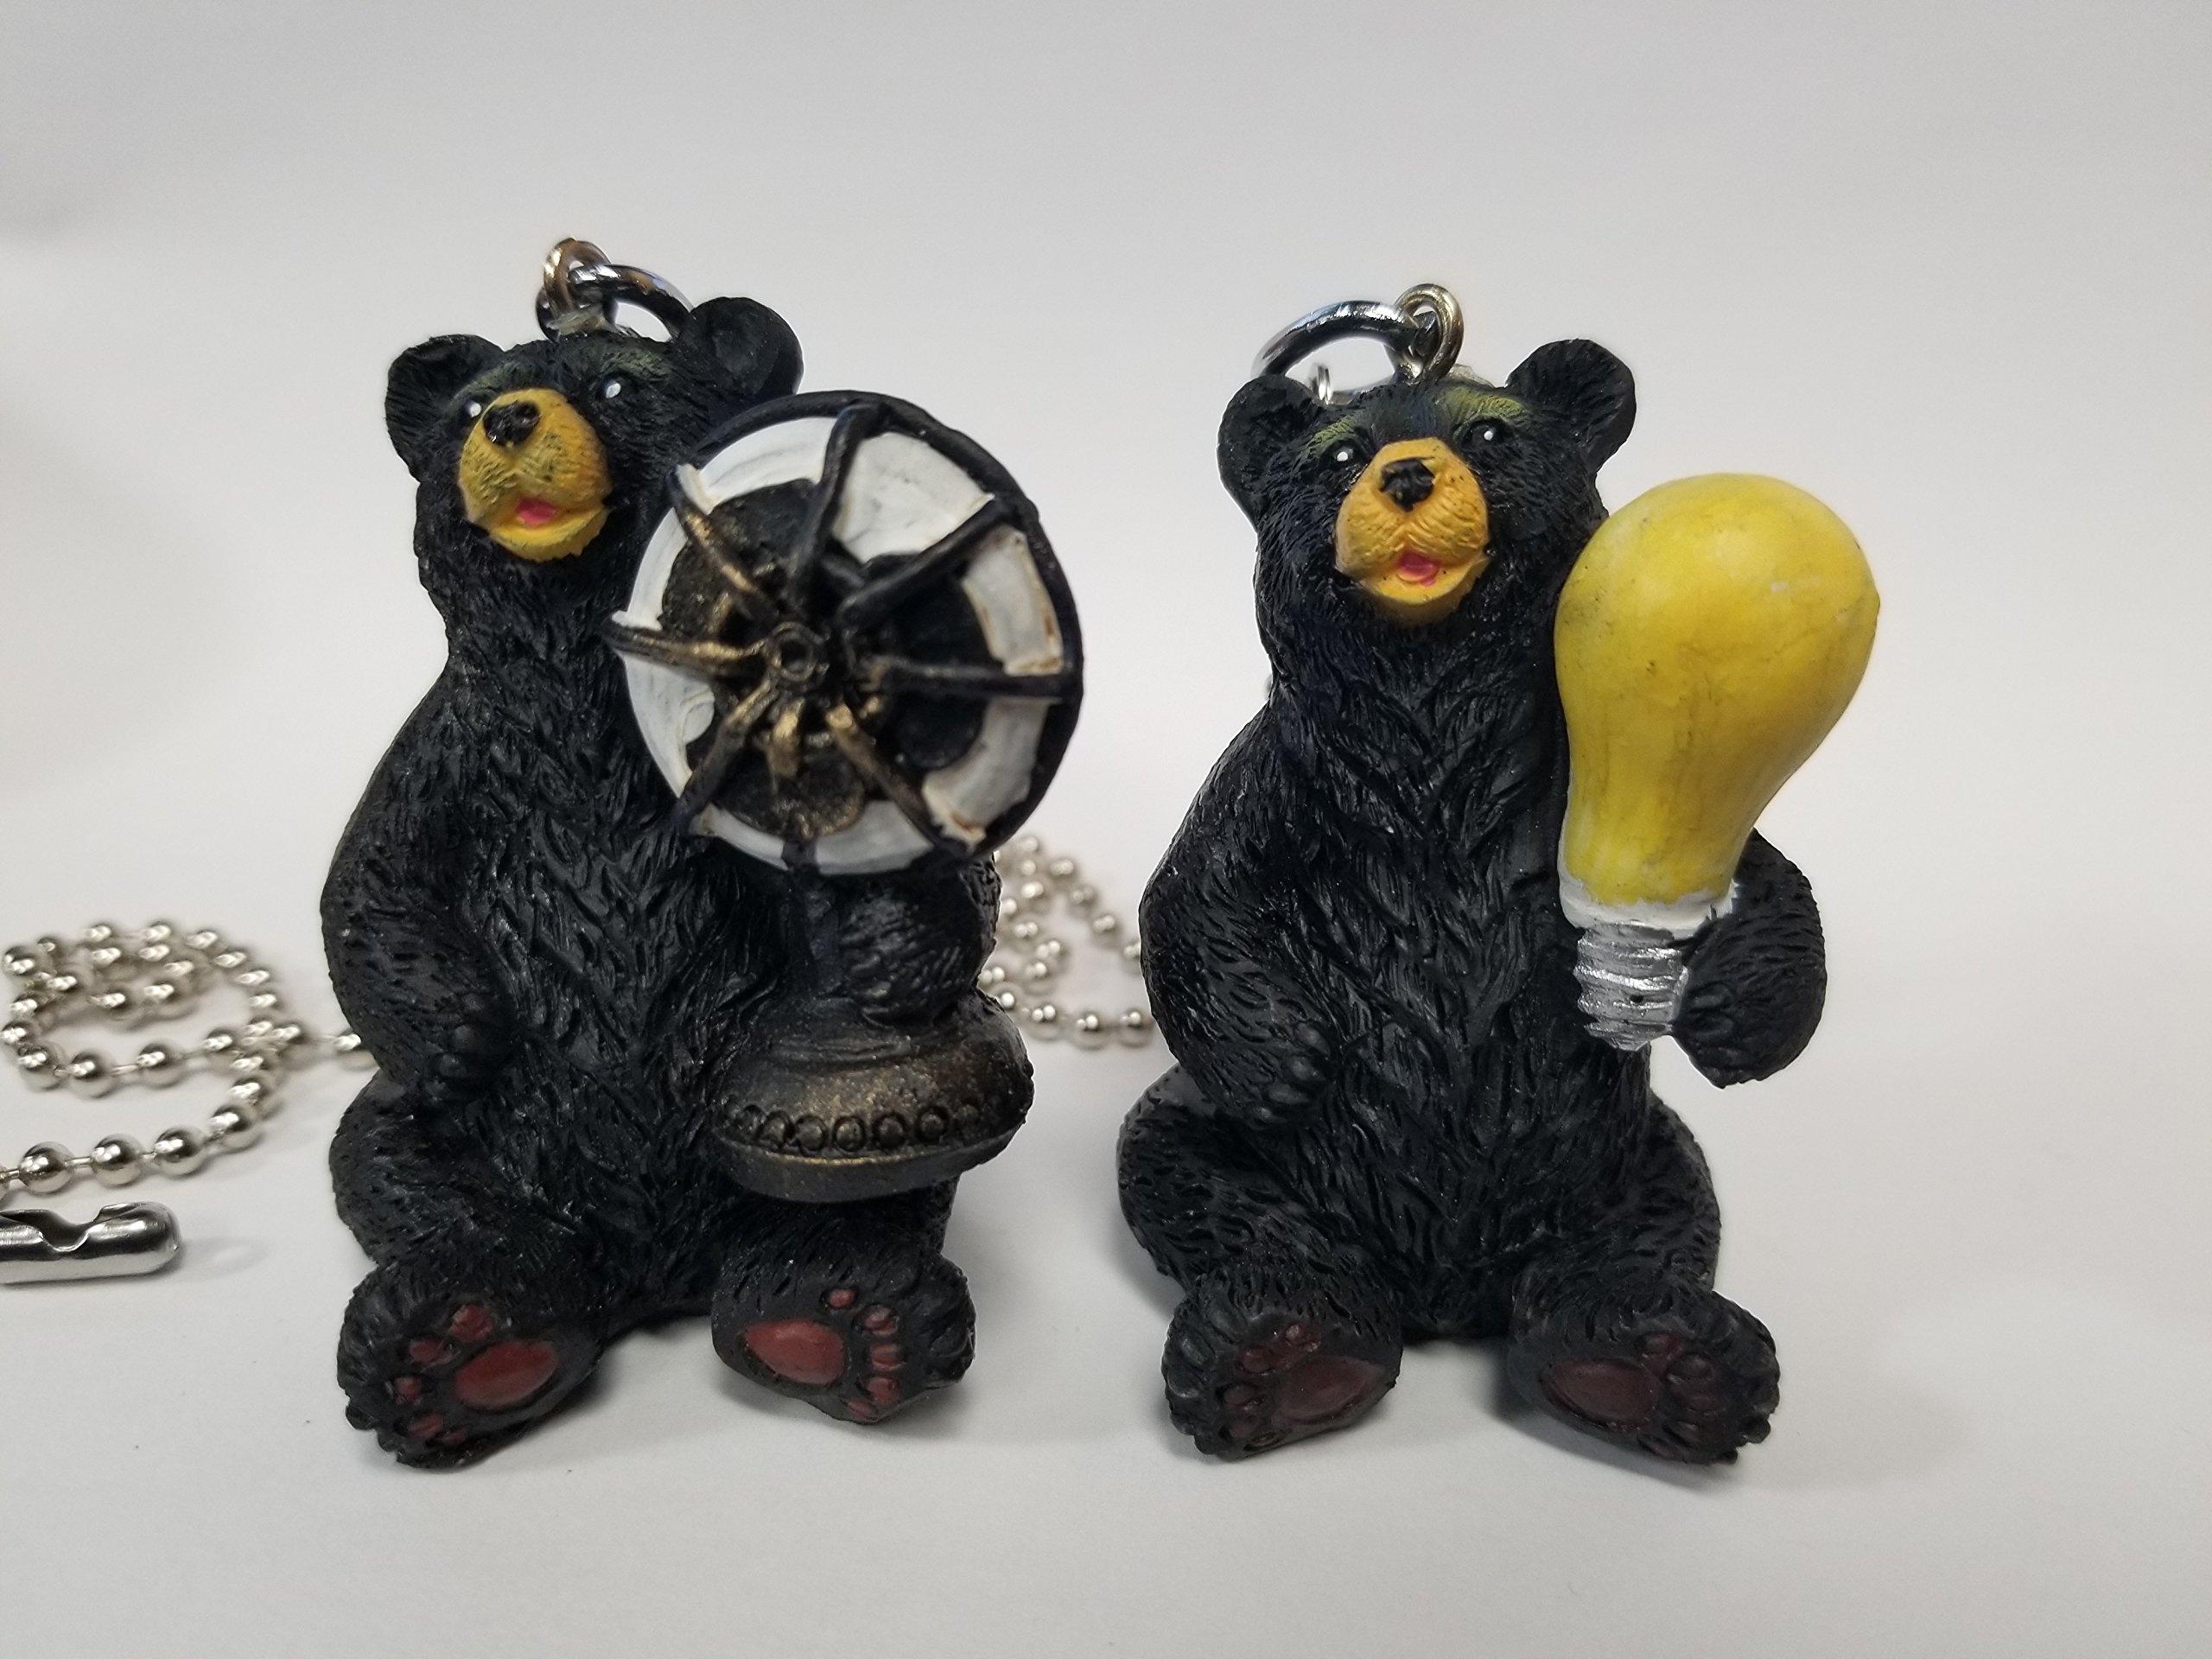 Black Bear Fan & Light Bulb Combo Nickel Pull Chain Set (1 Pair)